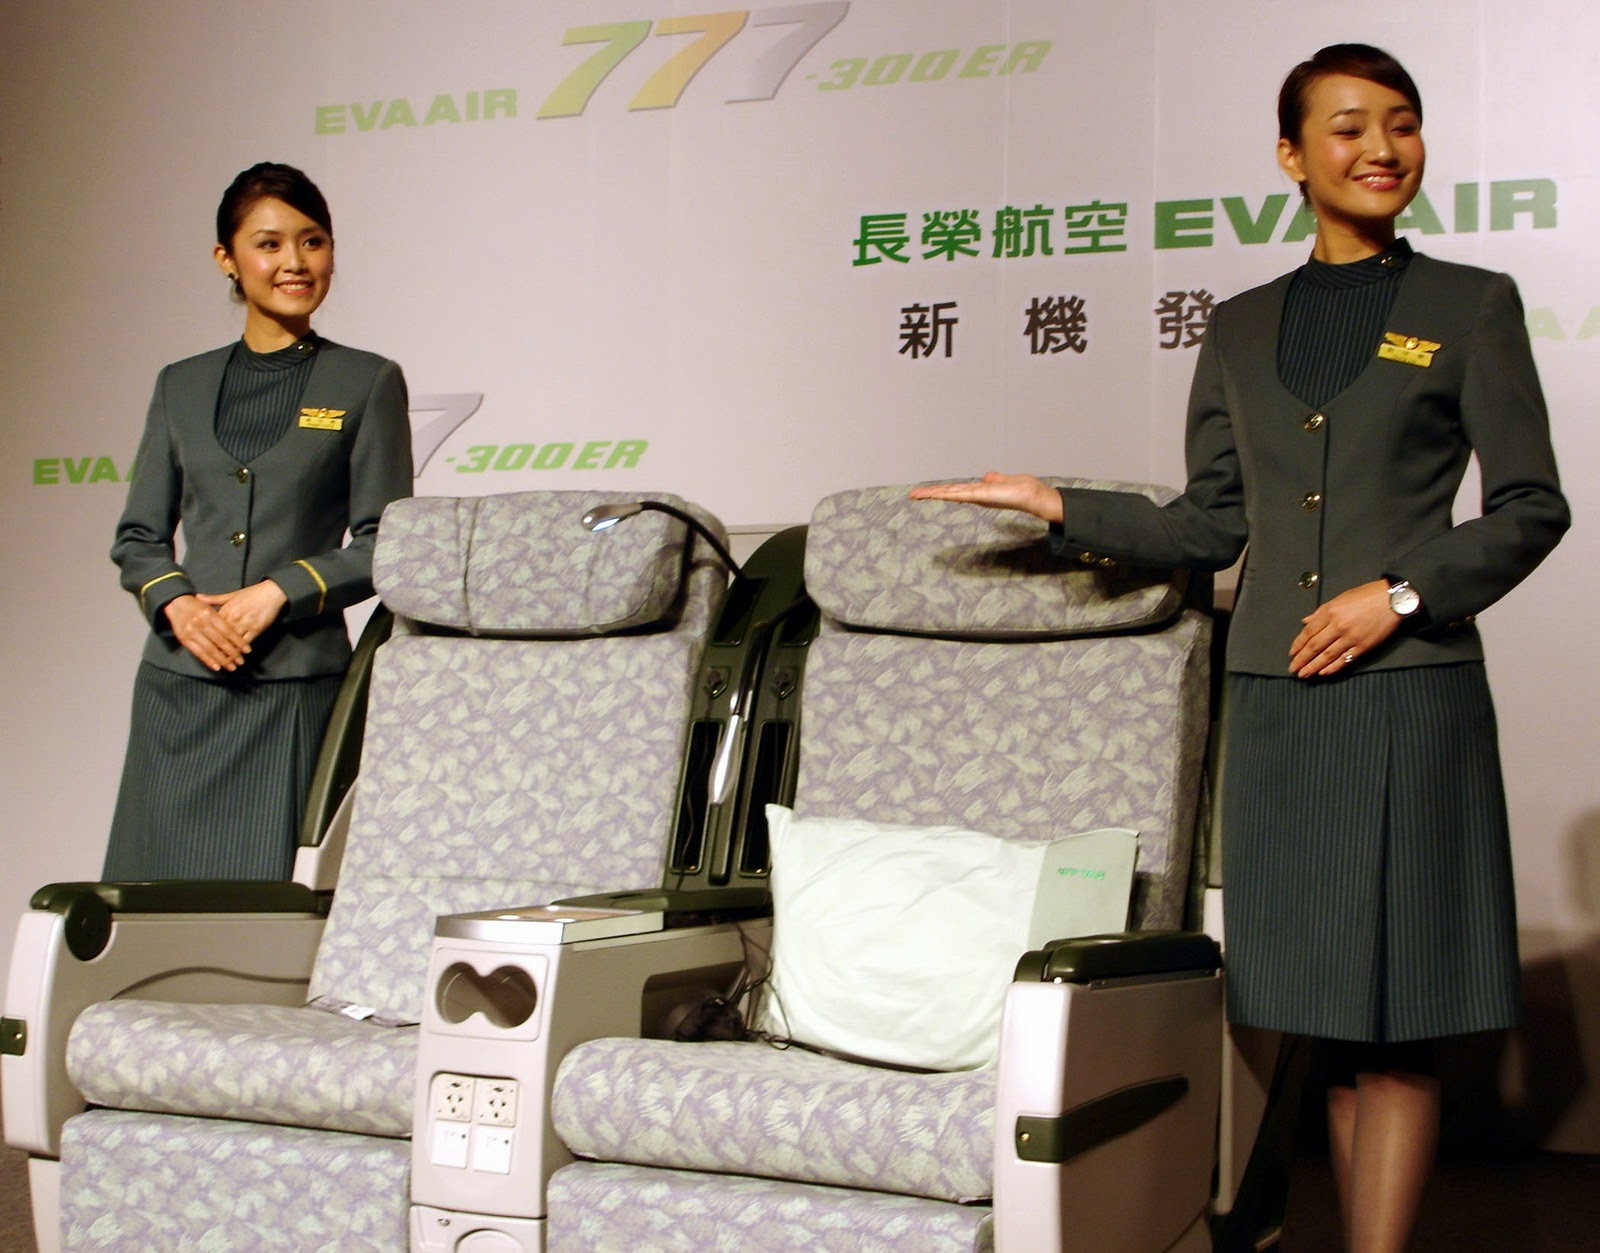 http://4.bp.blogspot.com/-ZUp6EtqBO7o/TsEiVikRZ0I/AAAAAAAAIW0/UDxFZa2ecUo/s1600/EVA+air+flight+attendant_4.jpg